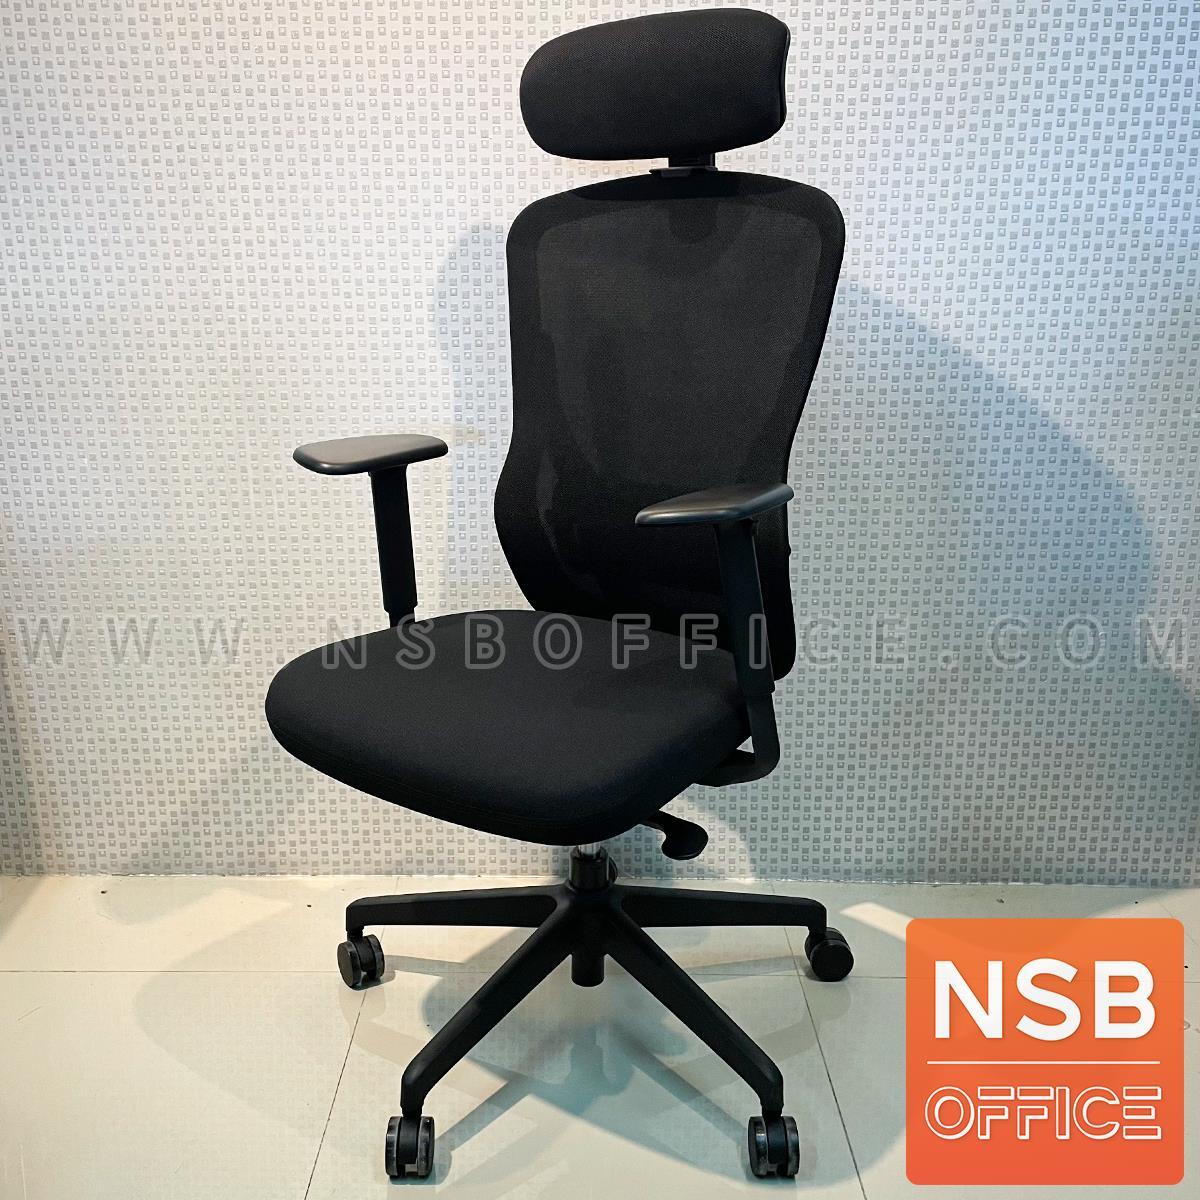 B28A133:เก้าอี้ผู้บริหารหลังเน็ต รุ่น Blackpearl (แบล็คเพิร์ล)  โช๊คแก๊ส มีก้อนโยก ขาพลาสติก